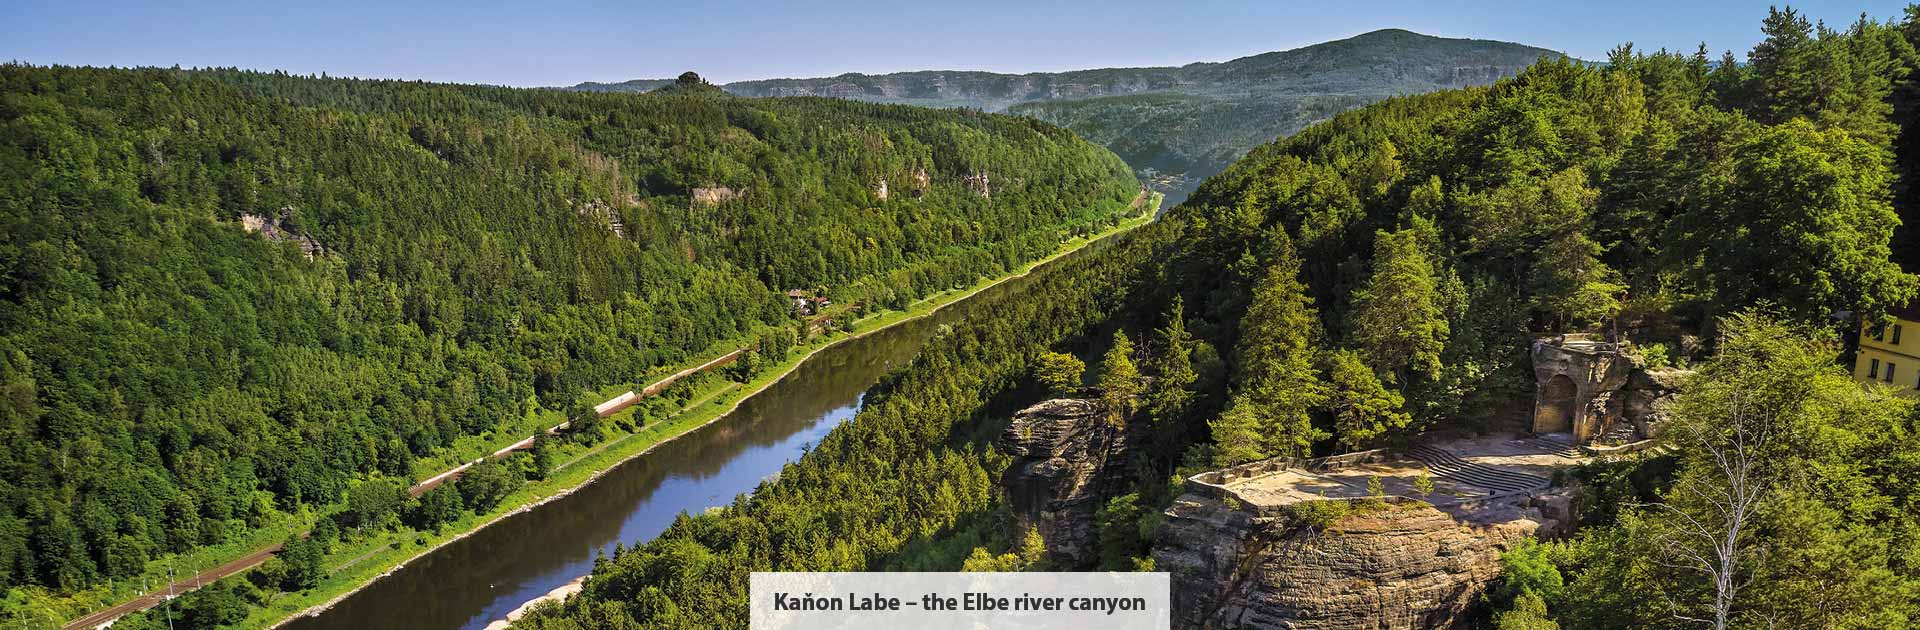 Kaňon Labe - Česká republika UNESCO